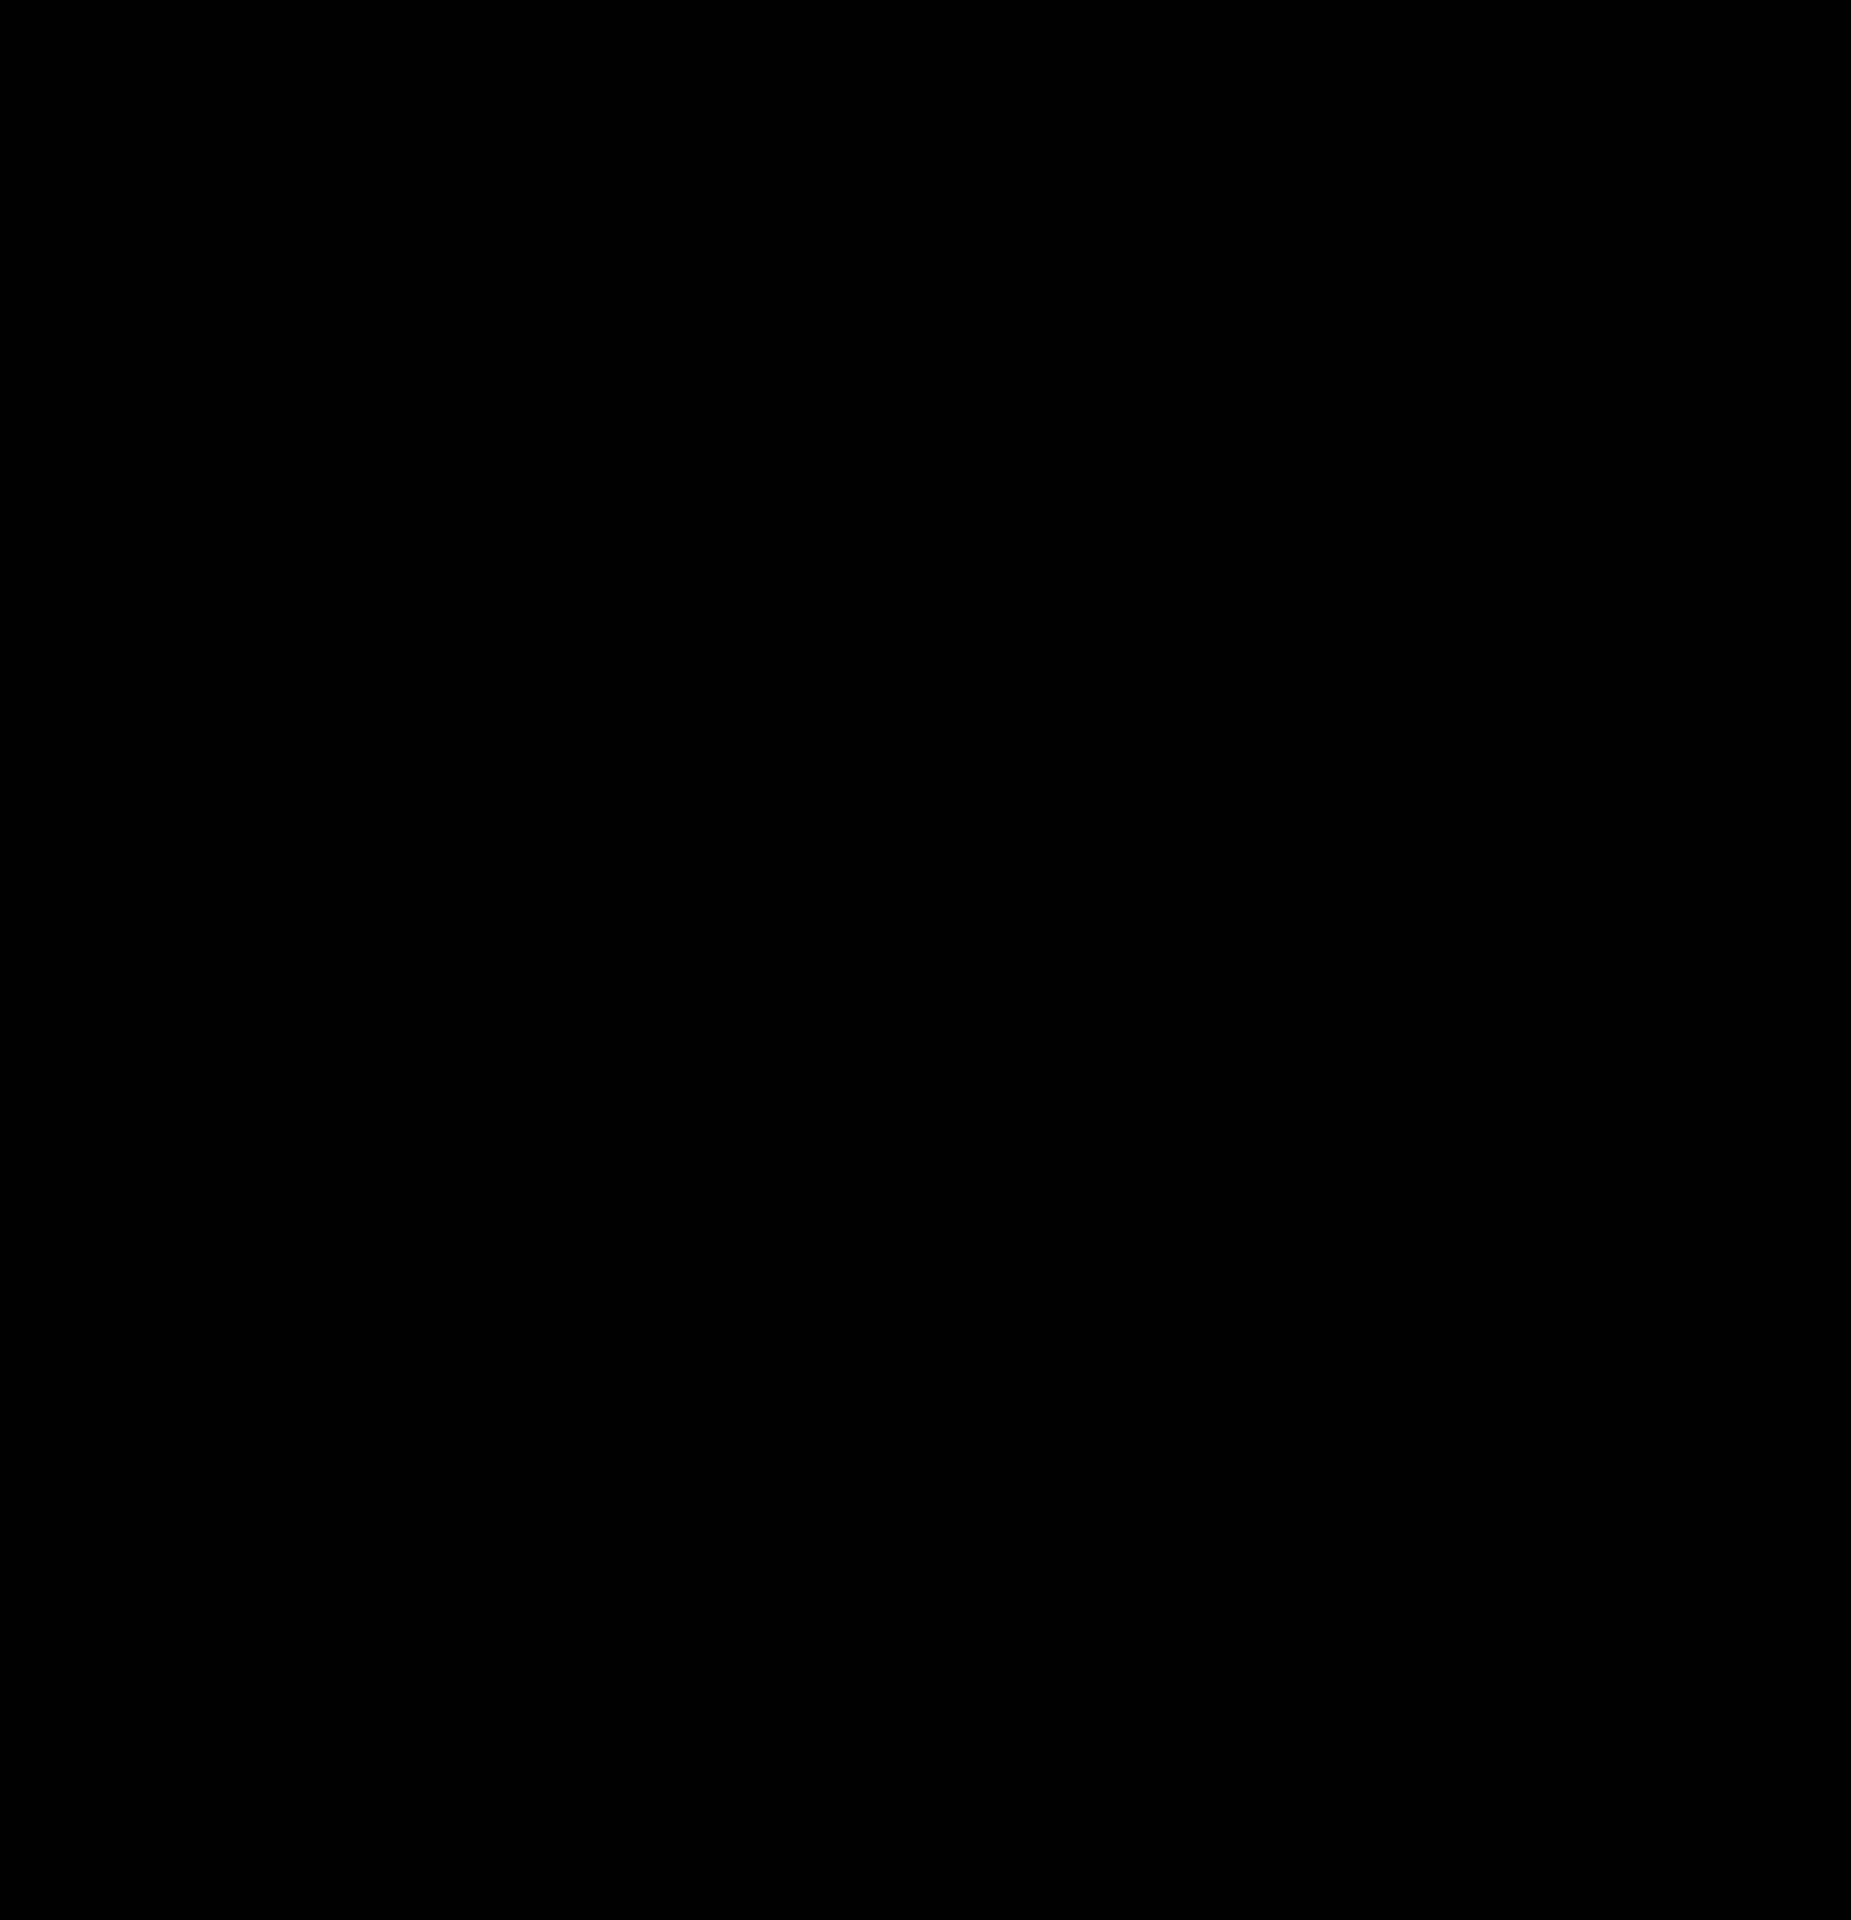 silhouette-4233622_1920